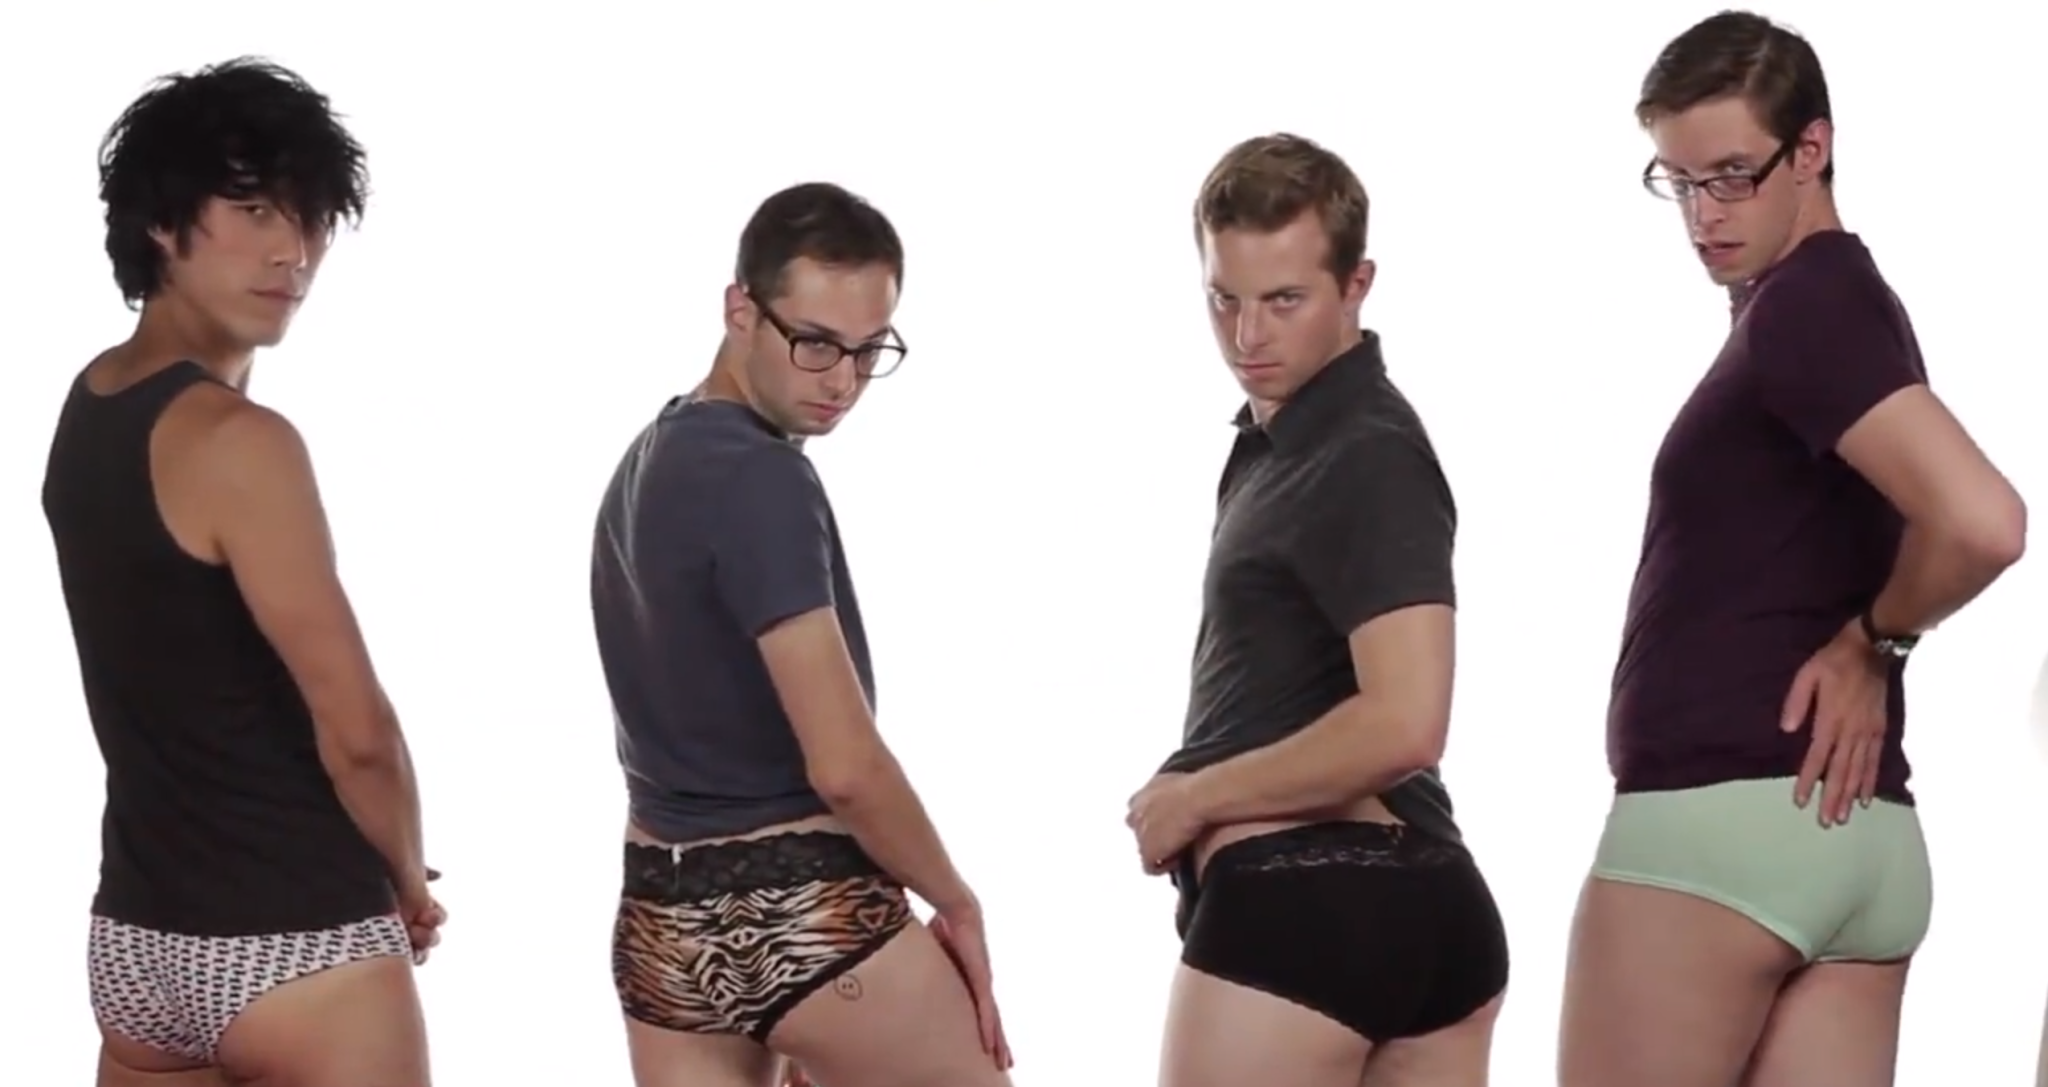 Women trying on panties